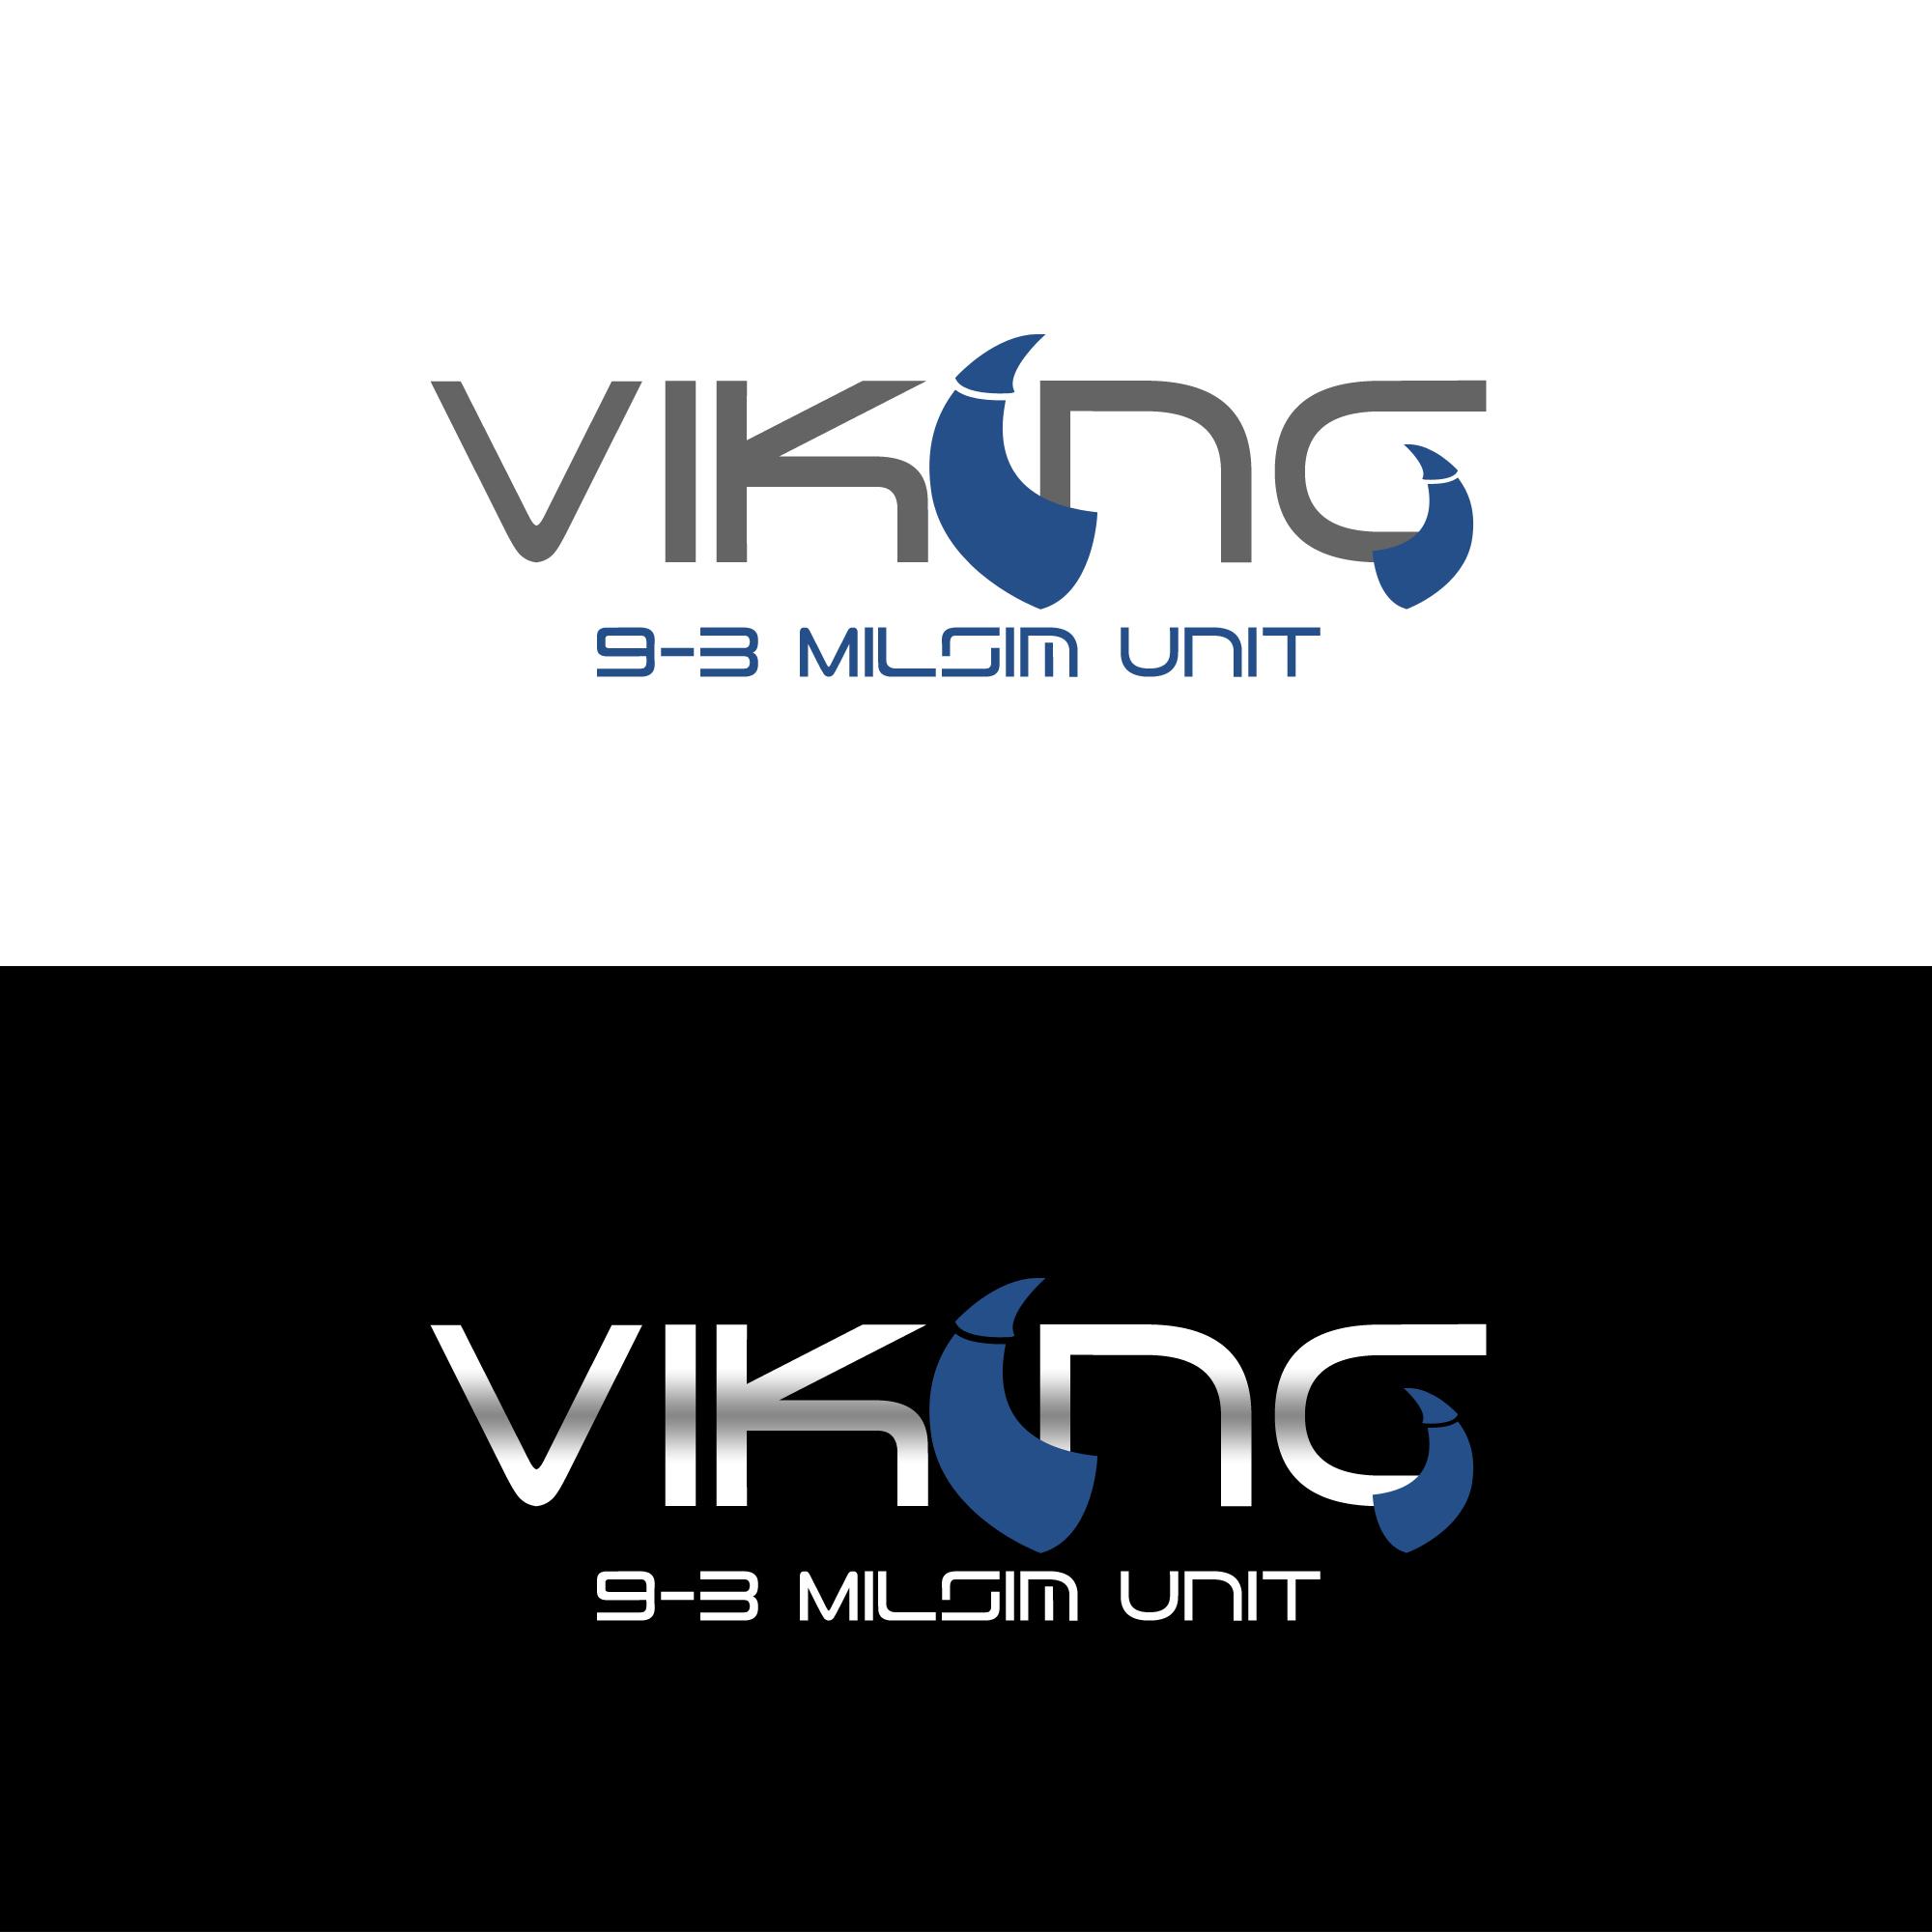 Logo Design by Kenneth Joel - Entry No. 2 in the Logo Design Contest Logo Design for Viking 9-3 MilSim Unit.